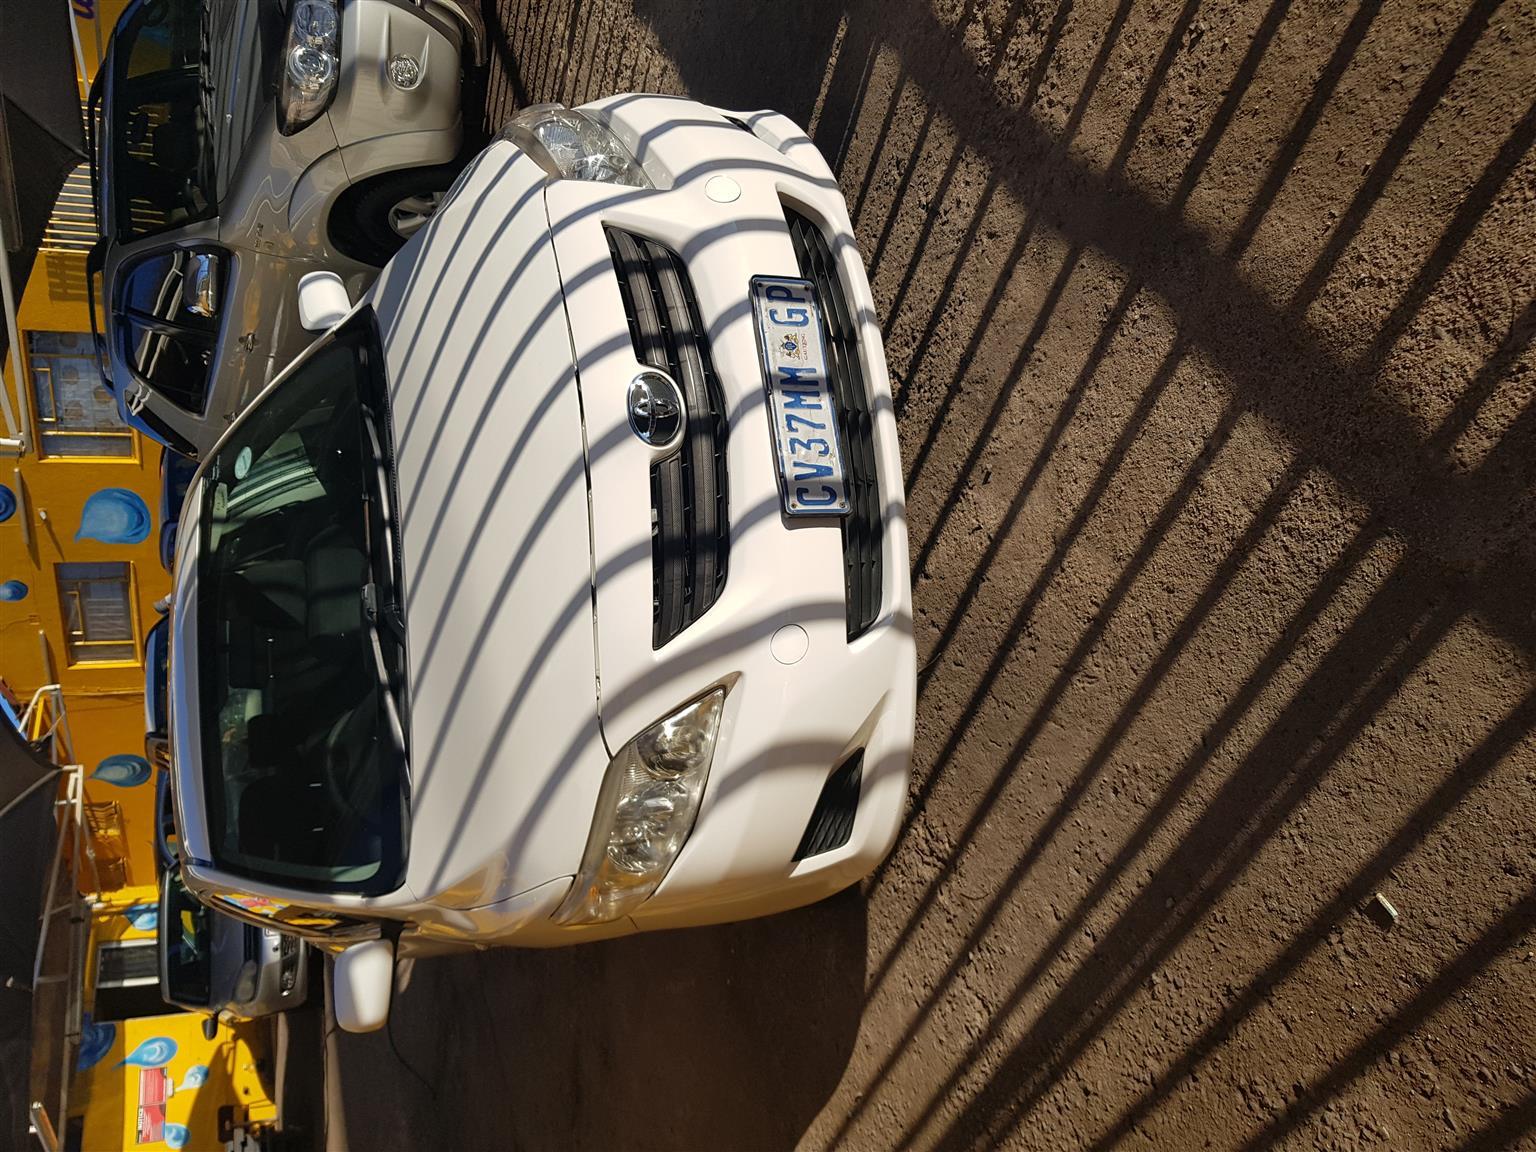 2009 Toyota Corolla 1.3 Advanced